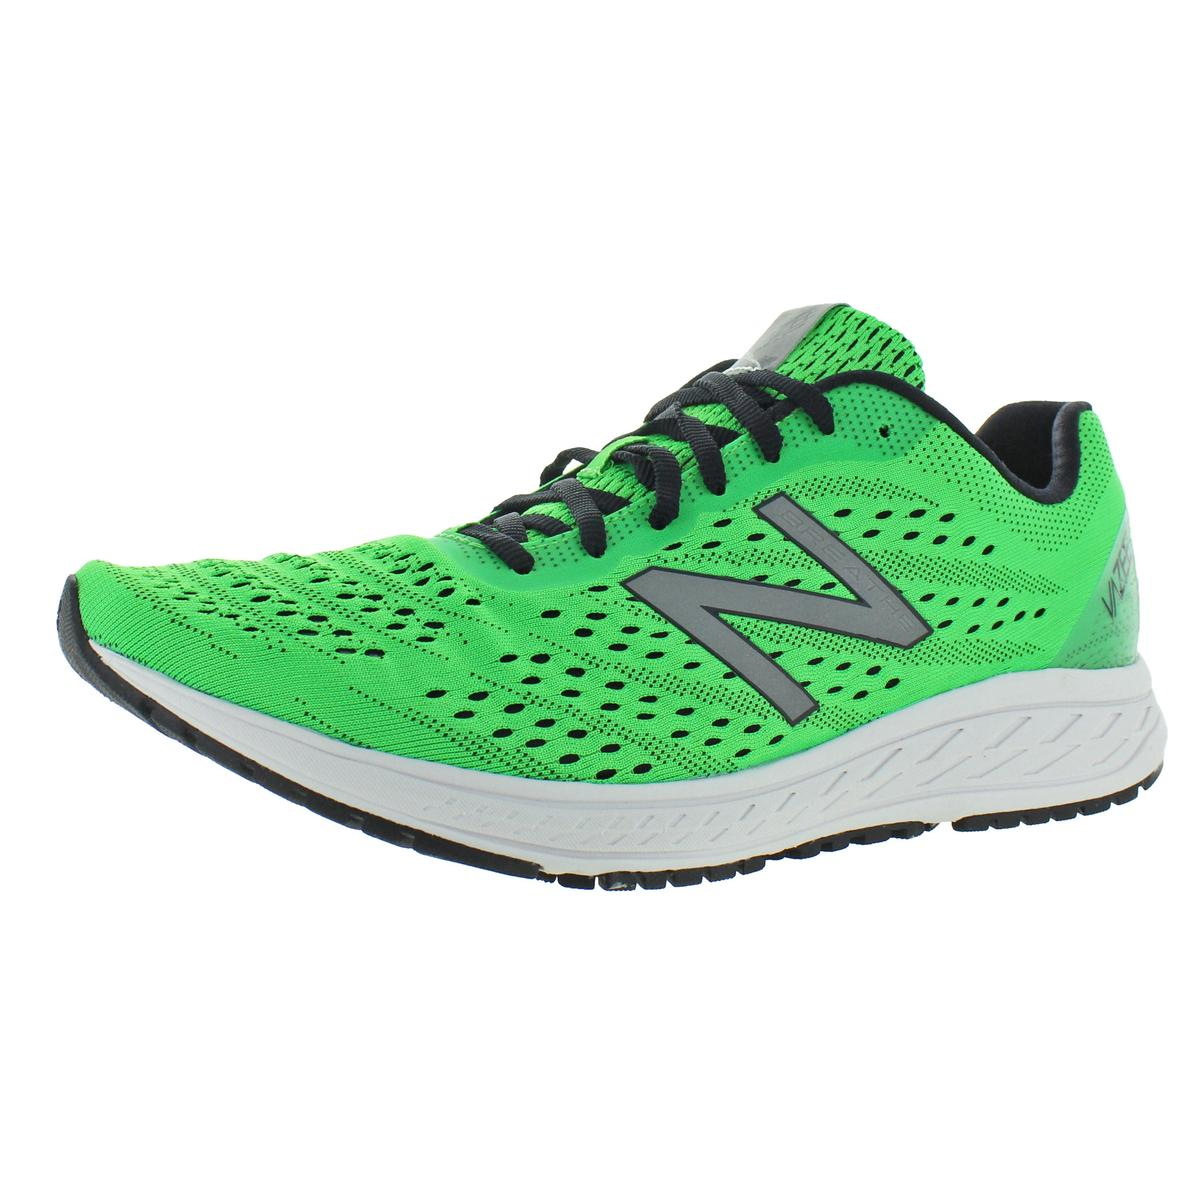 Mens vazee verde Correr New Balance Zapatos Tenis 12 mediano (D) BHFO 1076